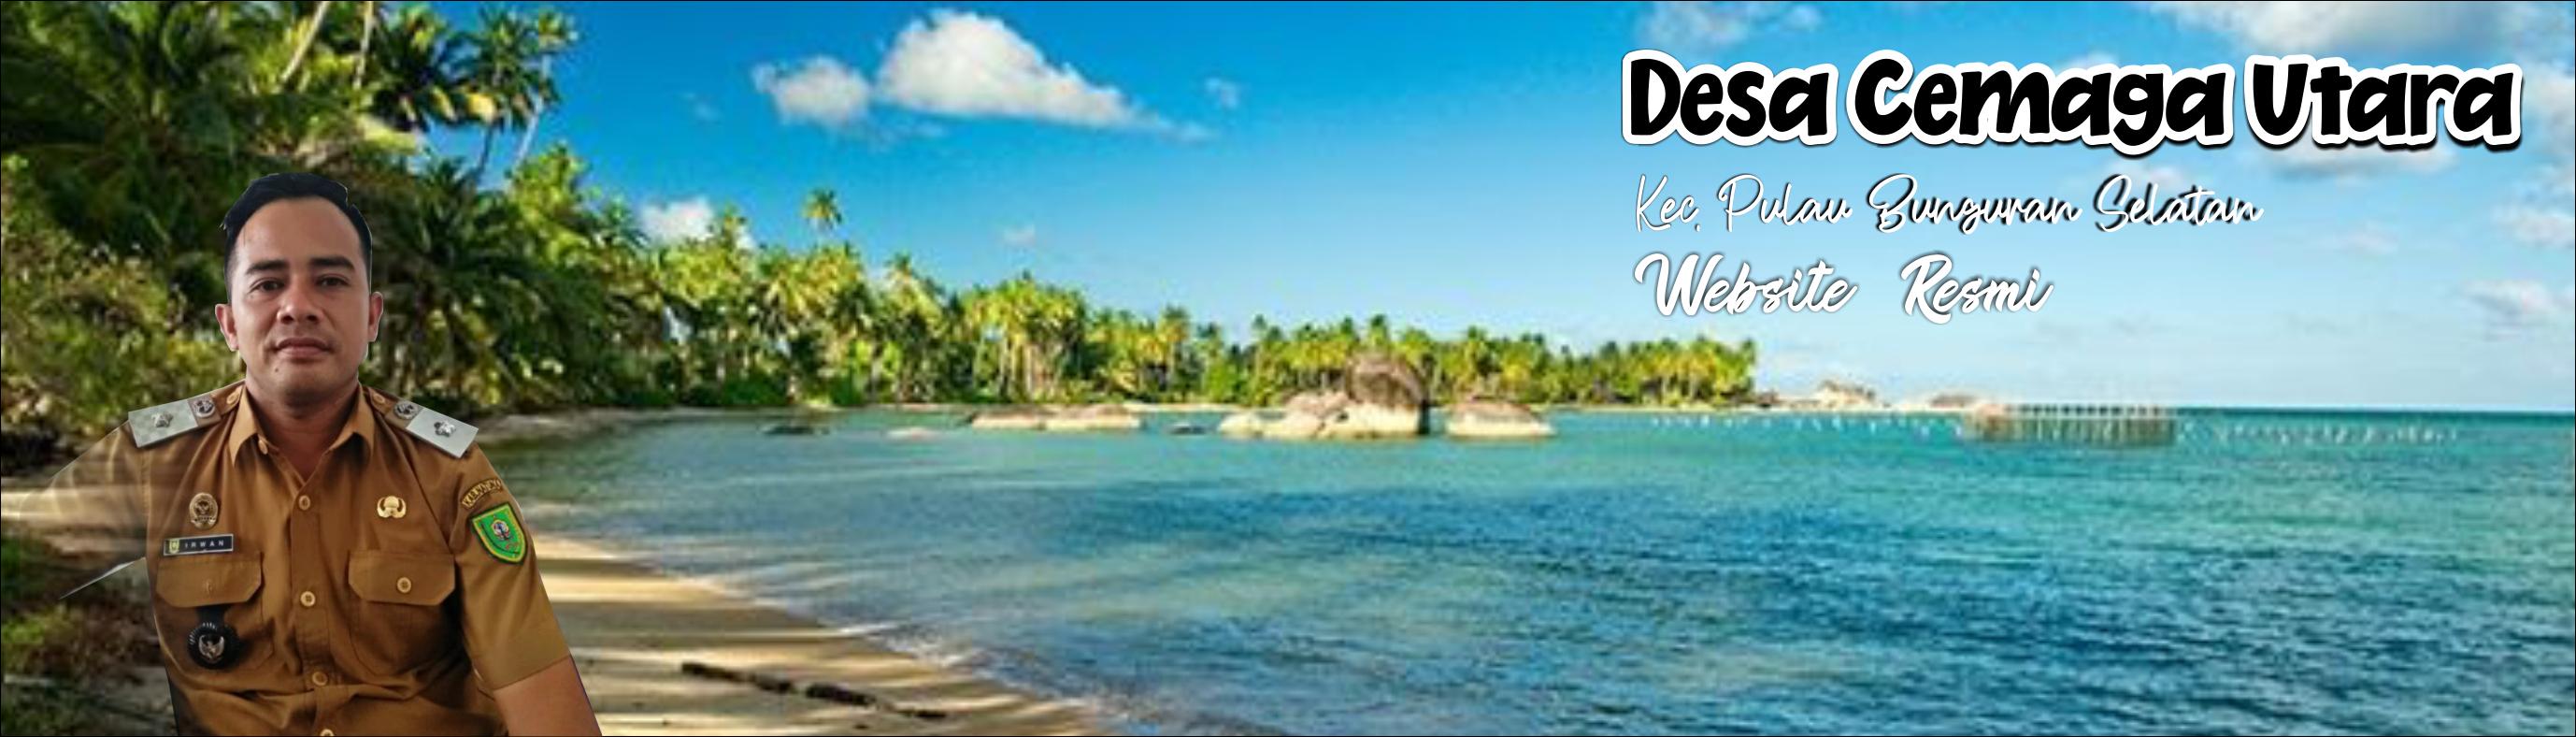 Desa Cemaga Utara